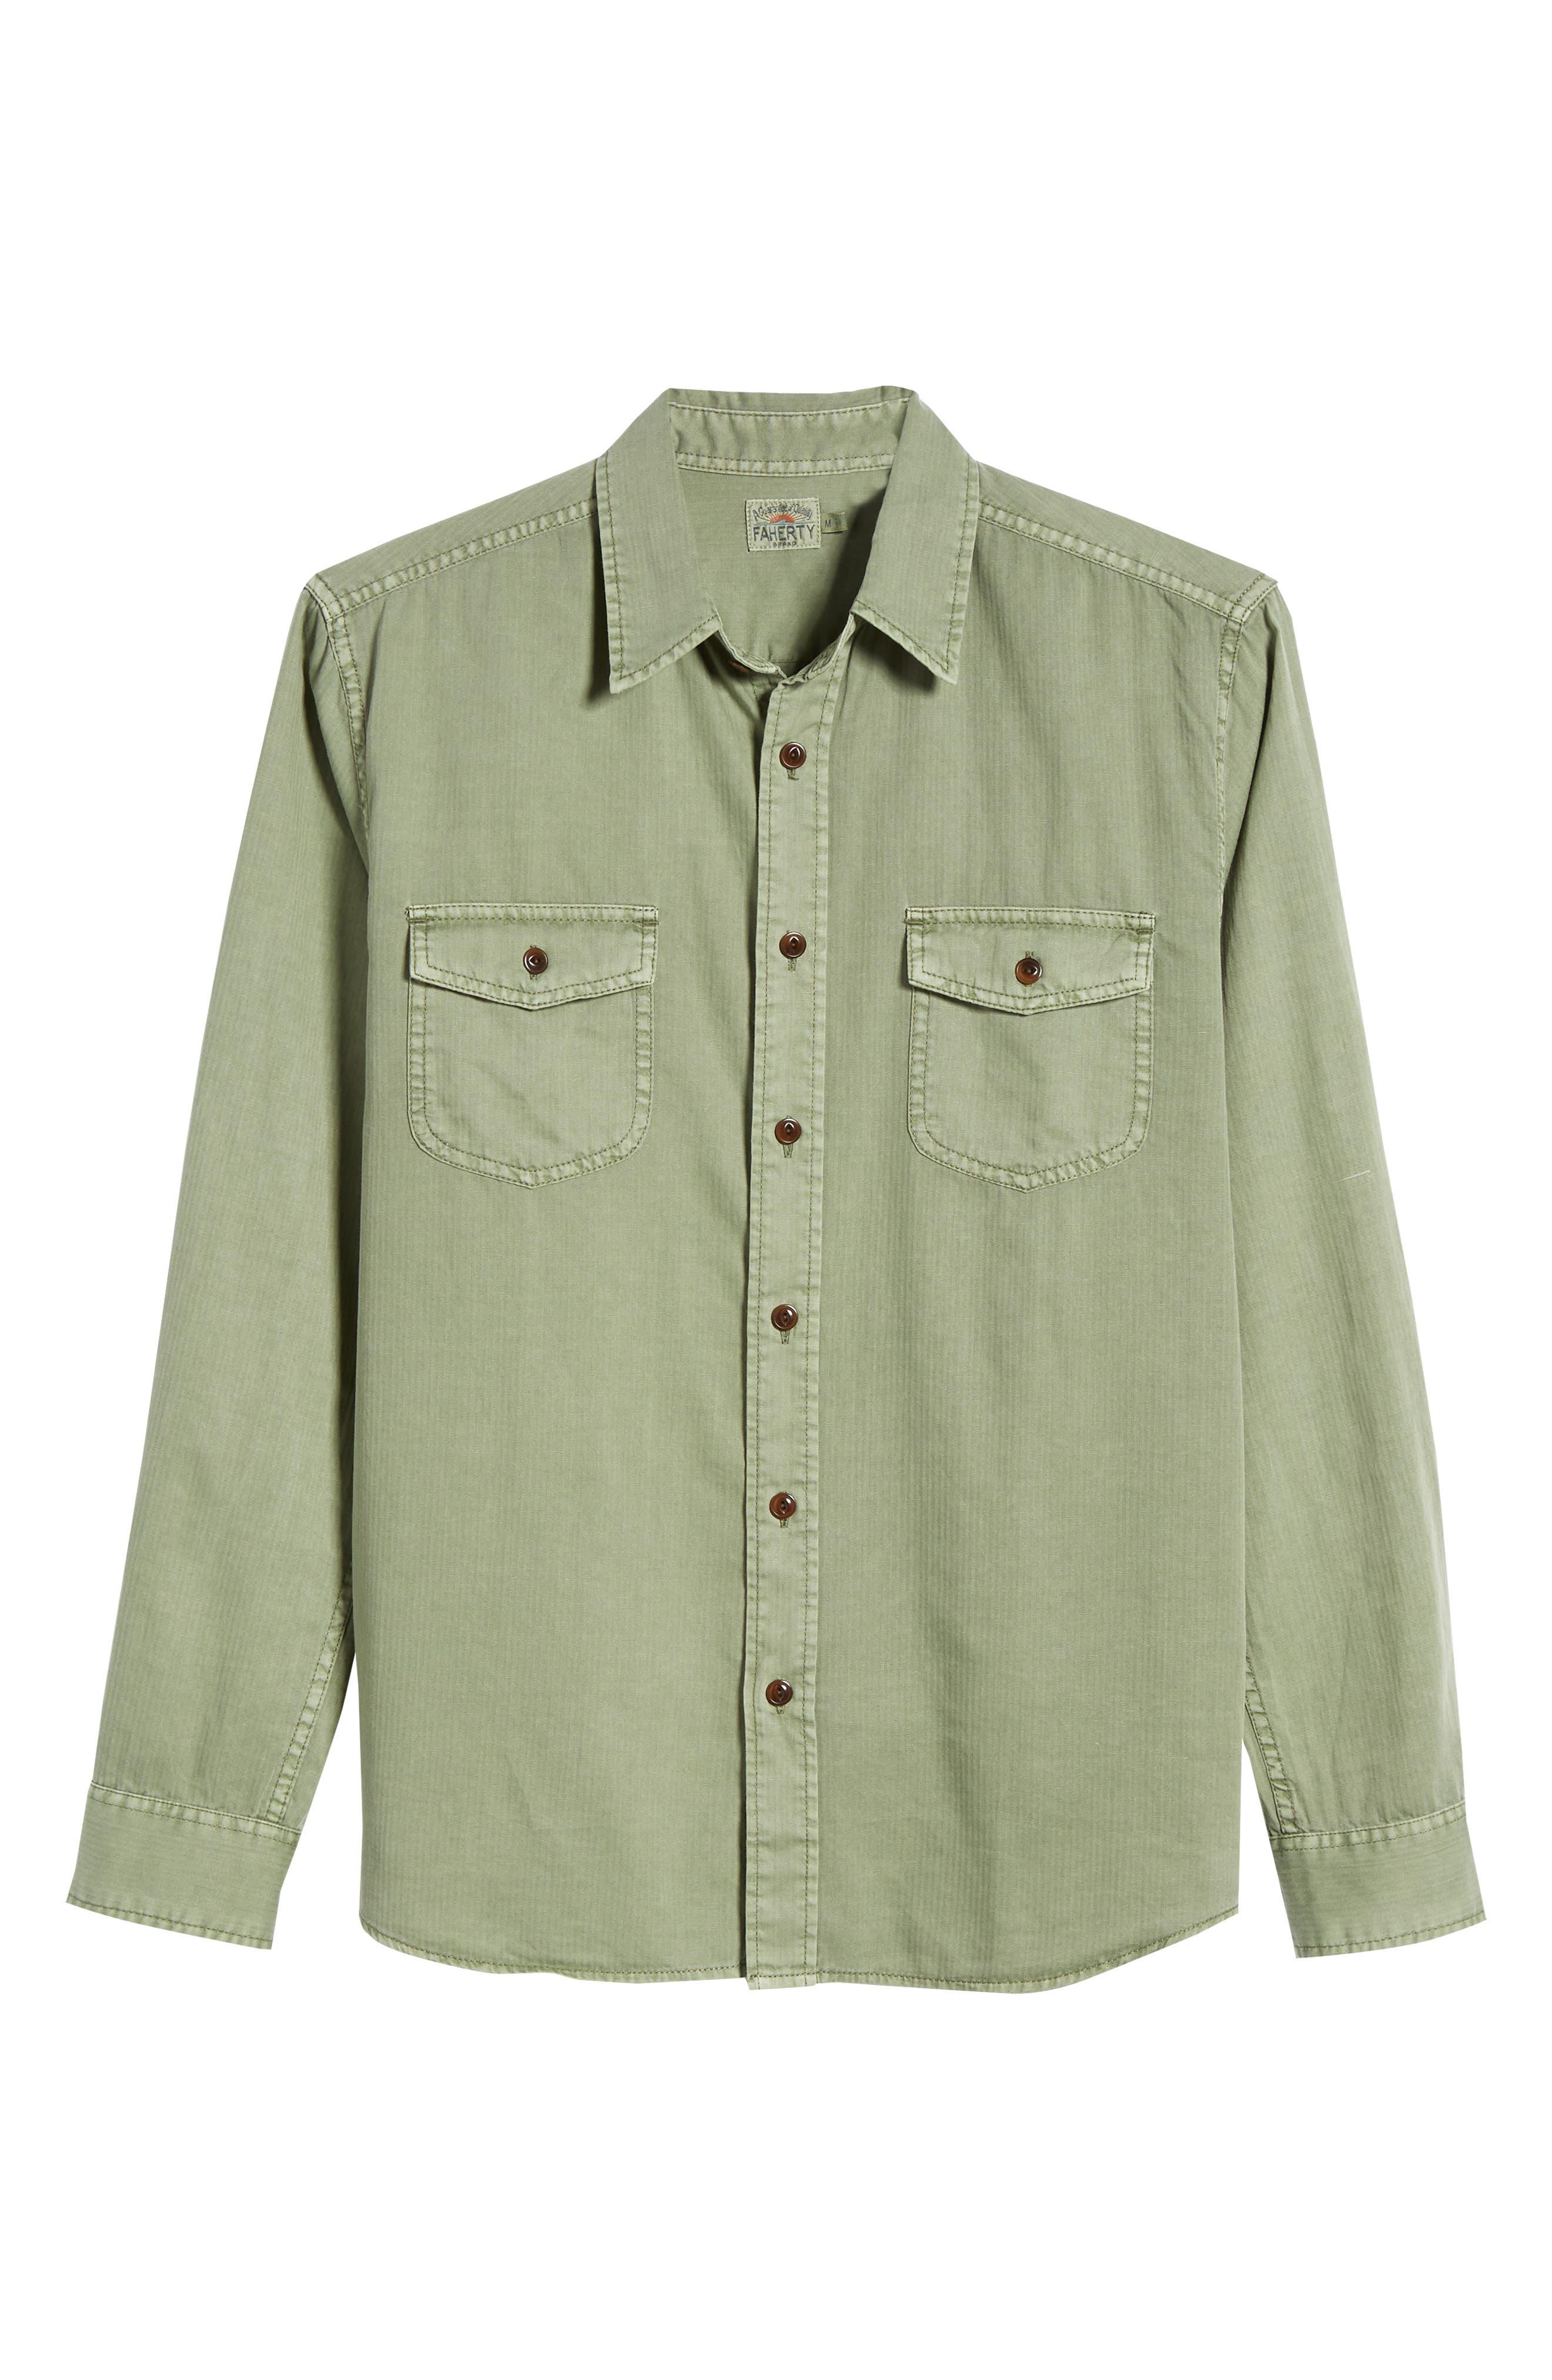 Radar Sport Shirt,                             Alternate thumbnail 6, color,                             Olive